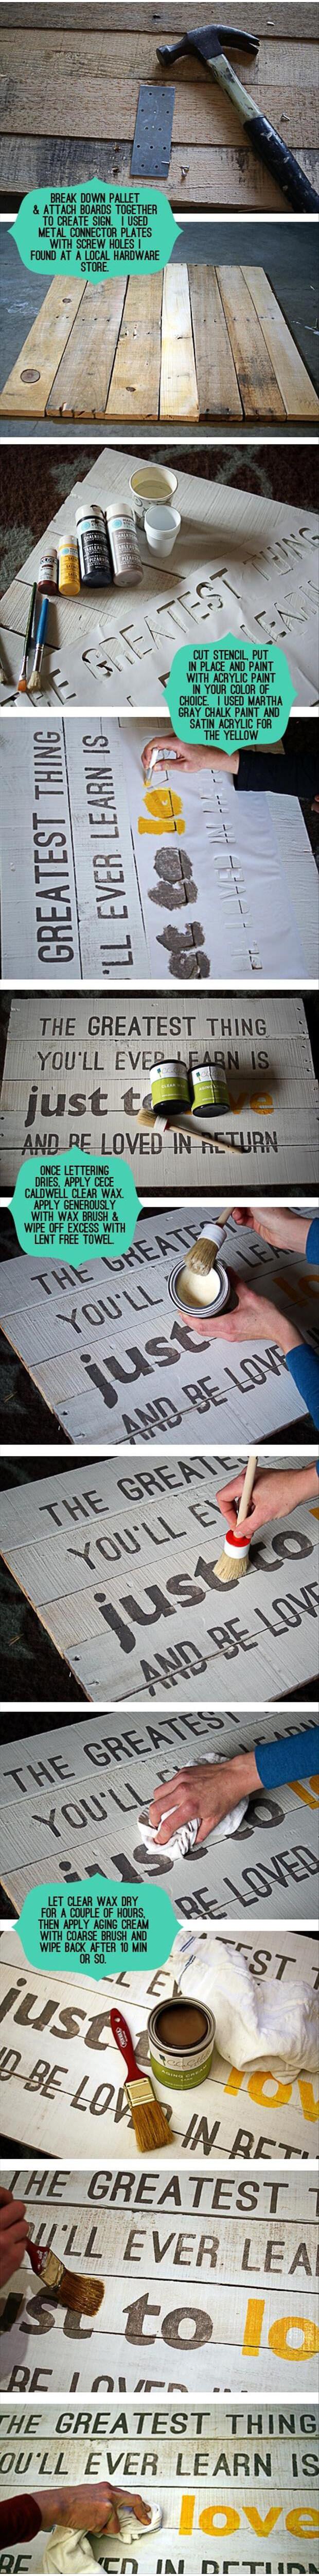 Wood Pallet Love Quote Art